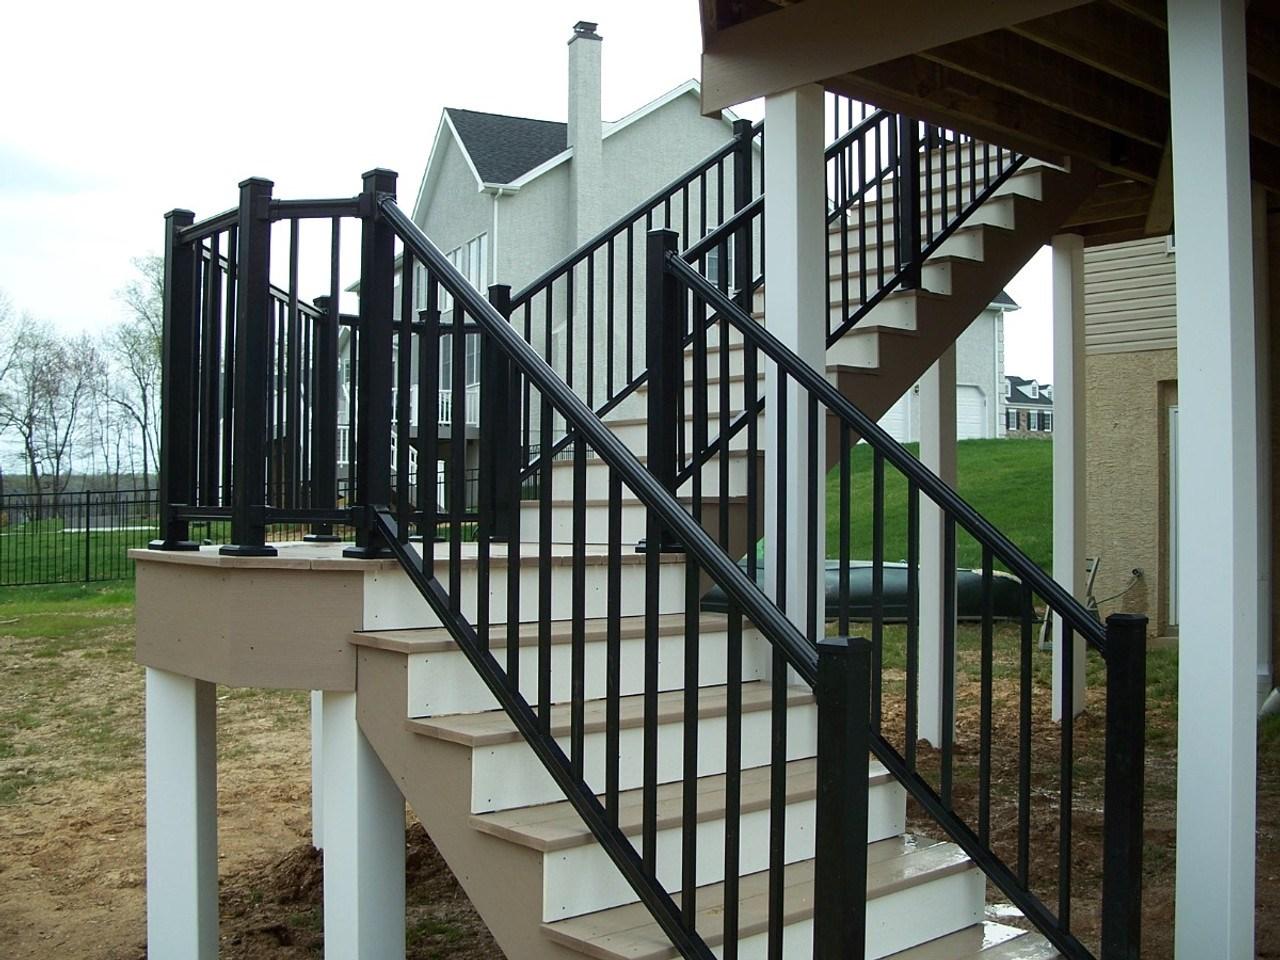 Key Link Arabian Series Aluminum Stair Railing Sections   Installing Aluminum Stair Railing   Baluster   Deck Stair   Balcony Deck   Railing Systems   Pressure Treated